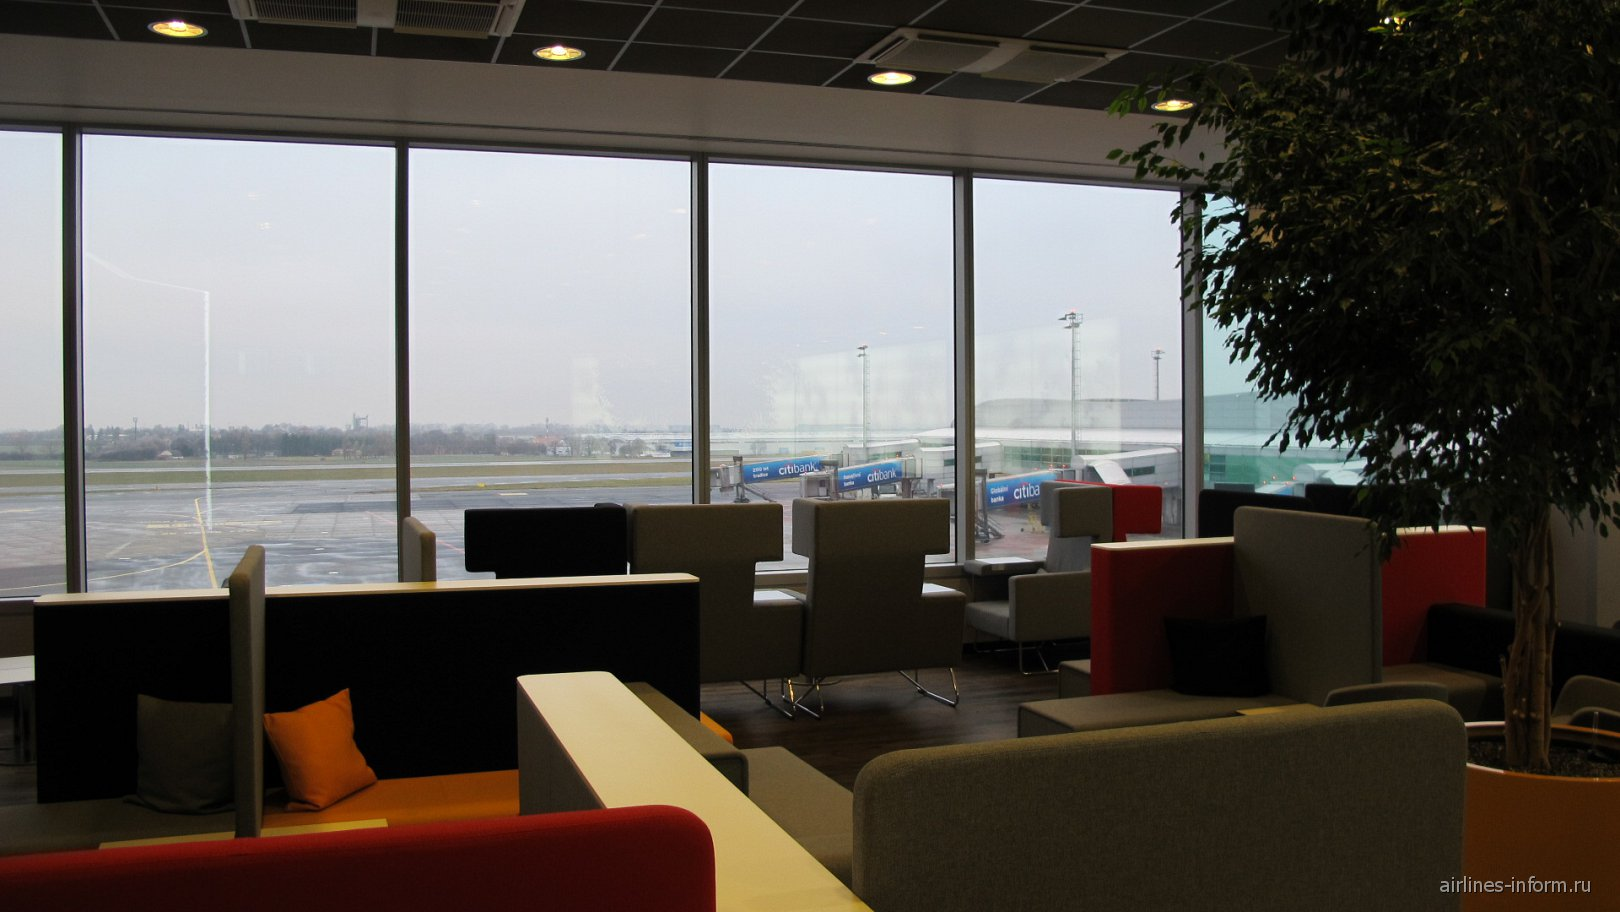 Бизнес-зал в терминале 1 аэропорта Прага Вацлав Гавел